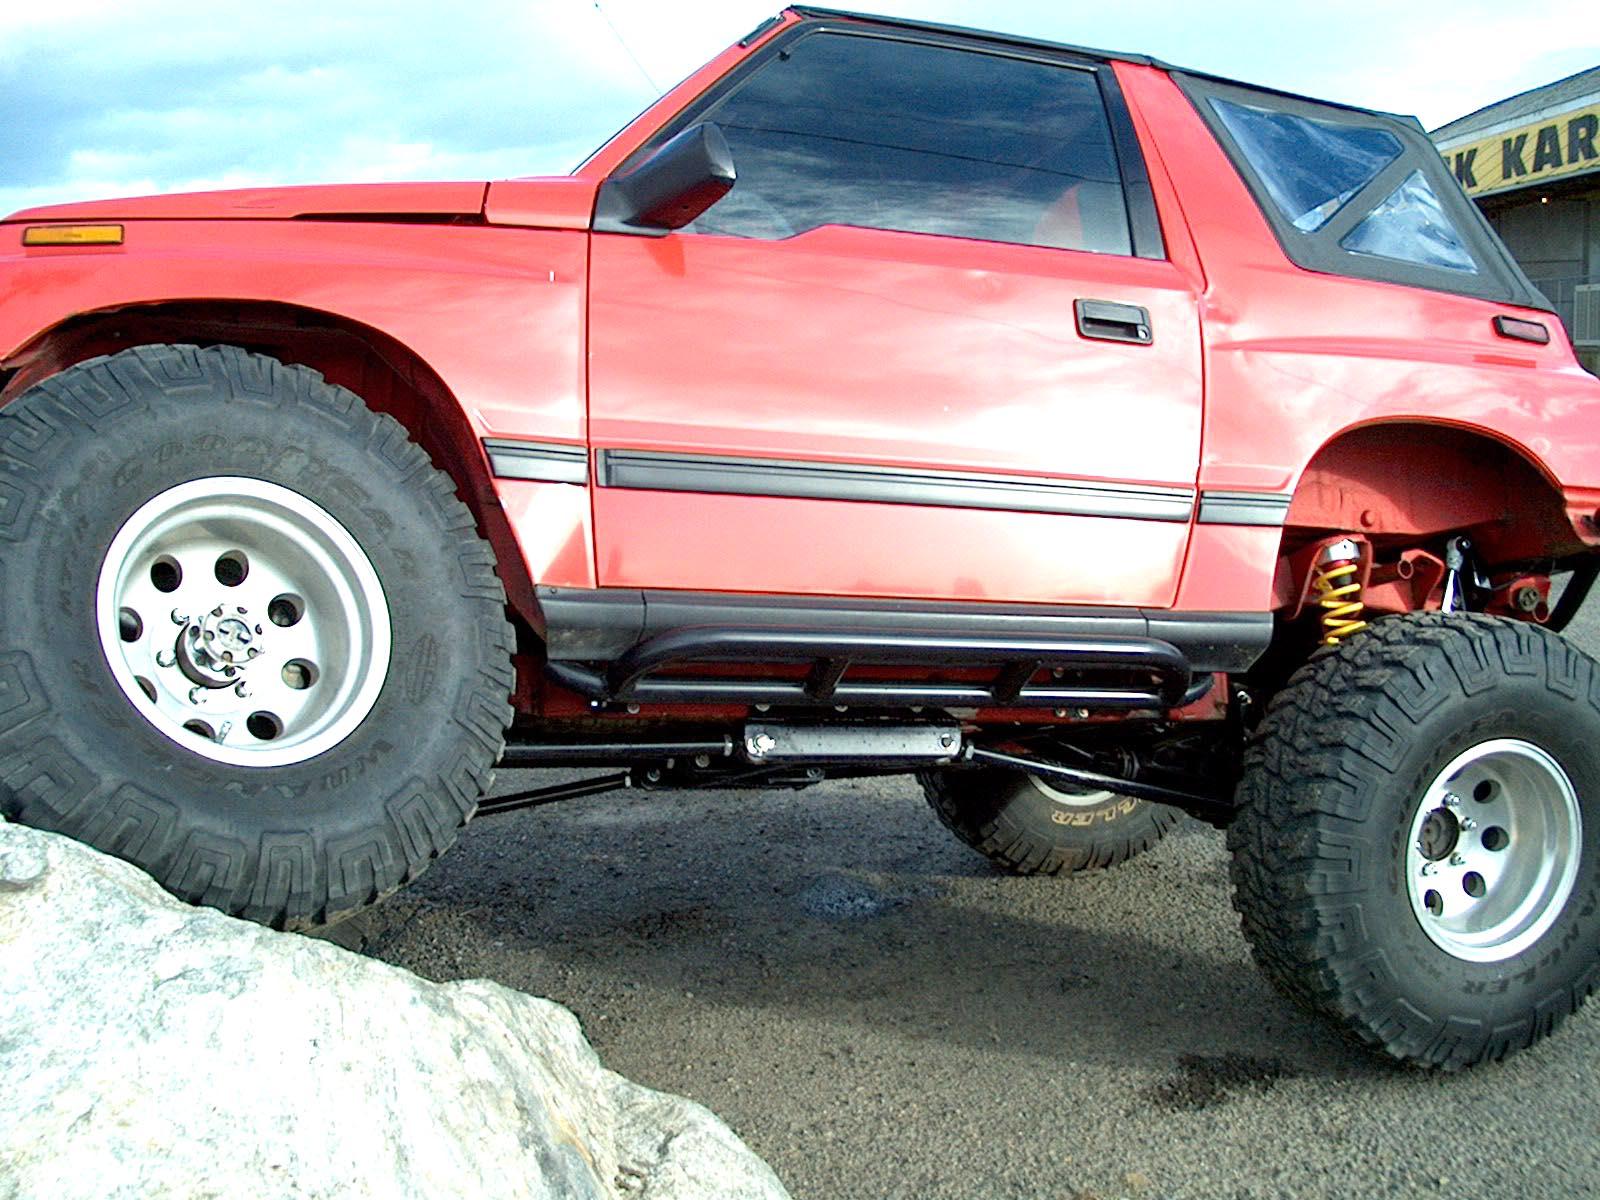 Used Suzuki Sidekick Parts